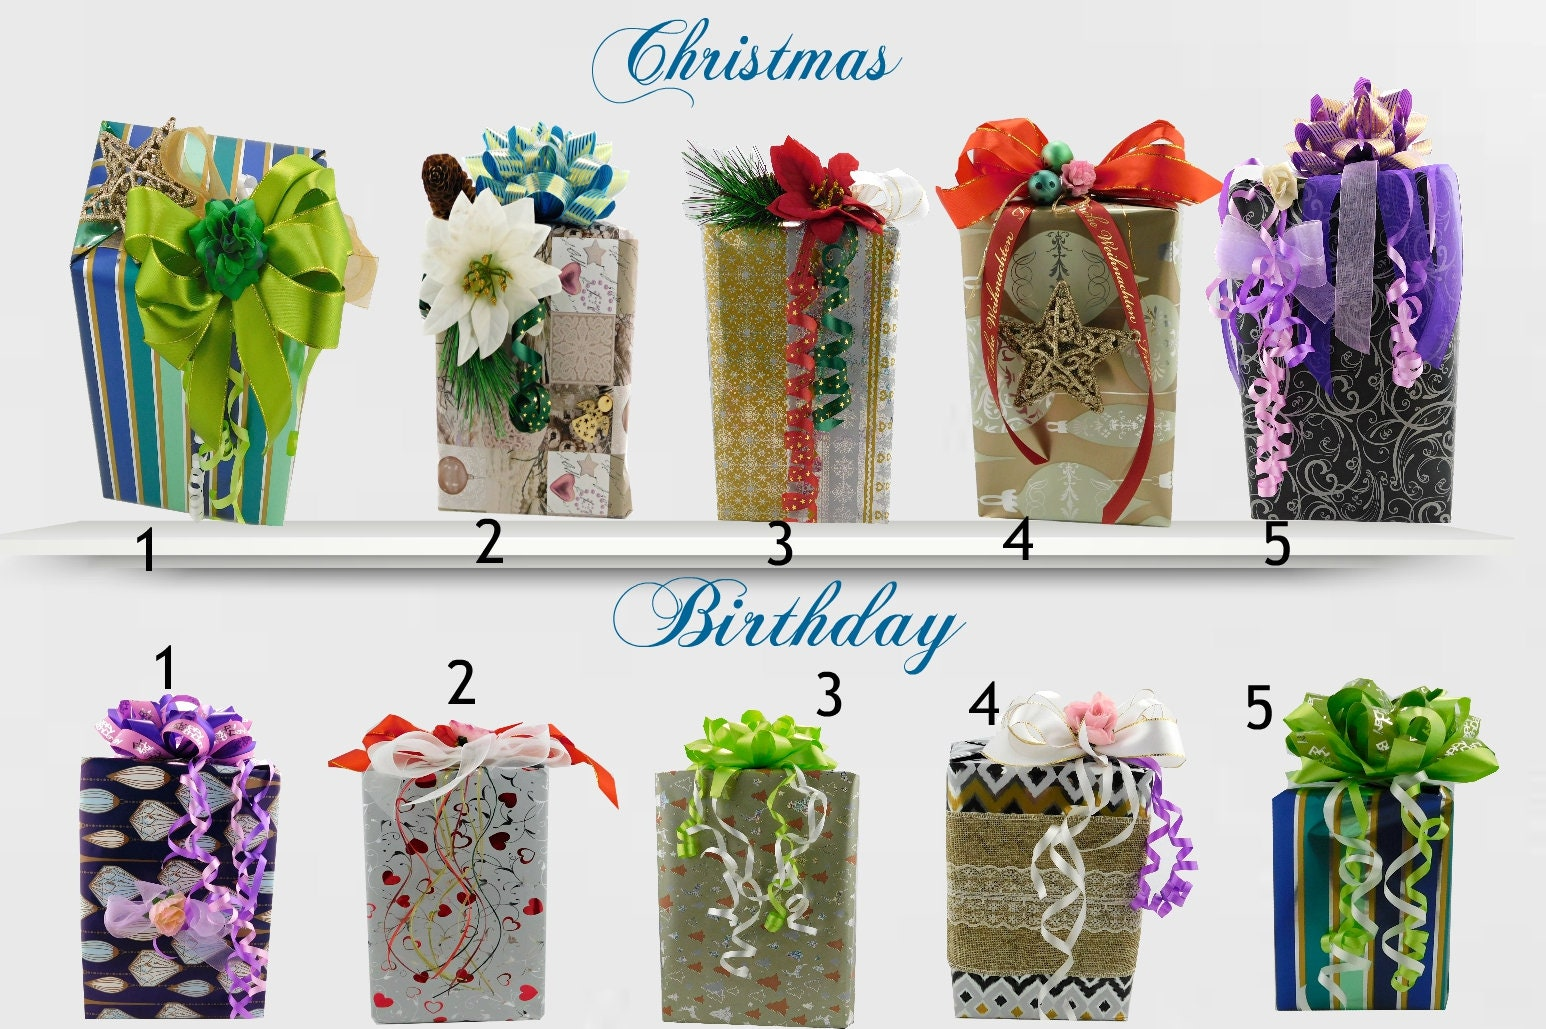 Birthday Gift Box For Girls 12 Dancing Princesses Kids Playroom